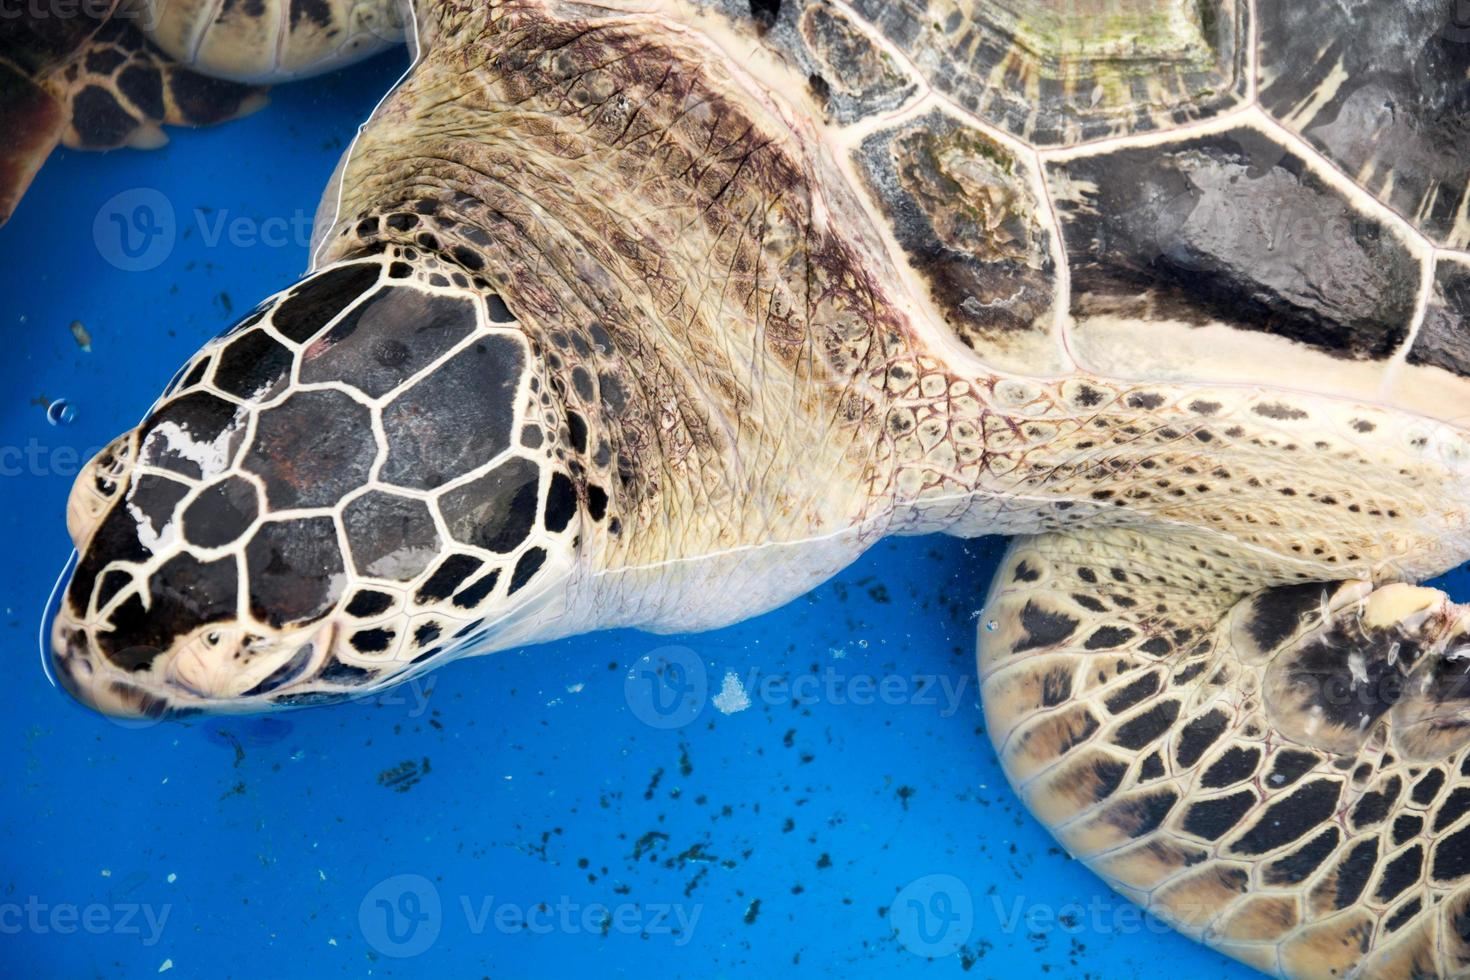 Sea turtle conservation photo